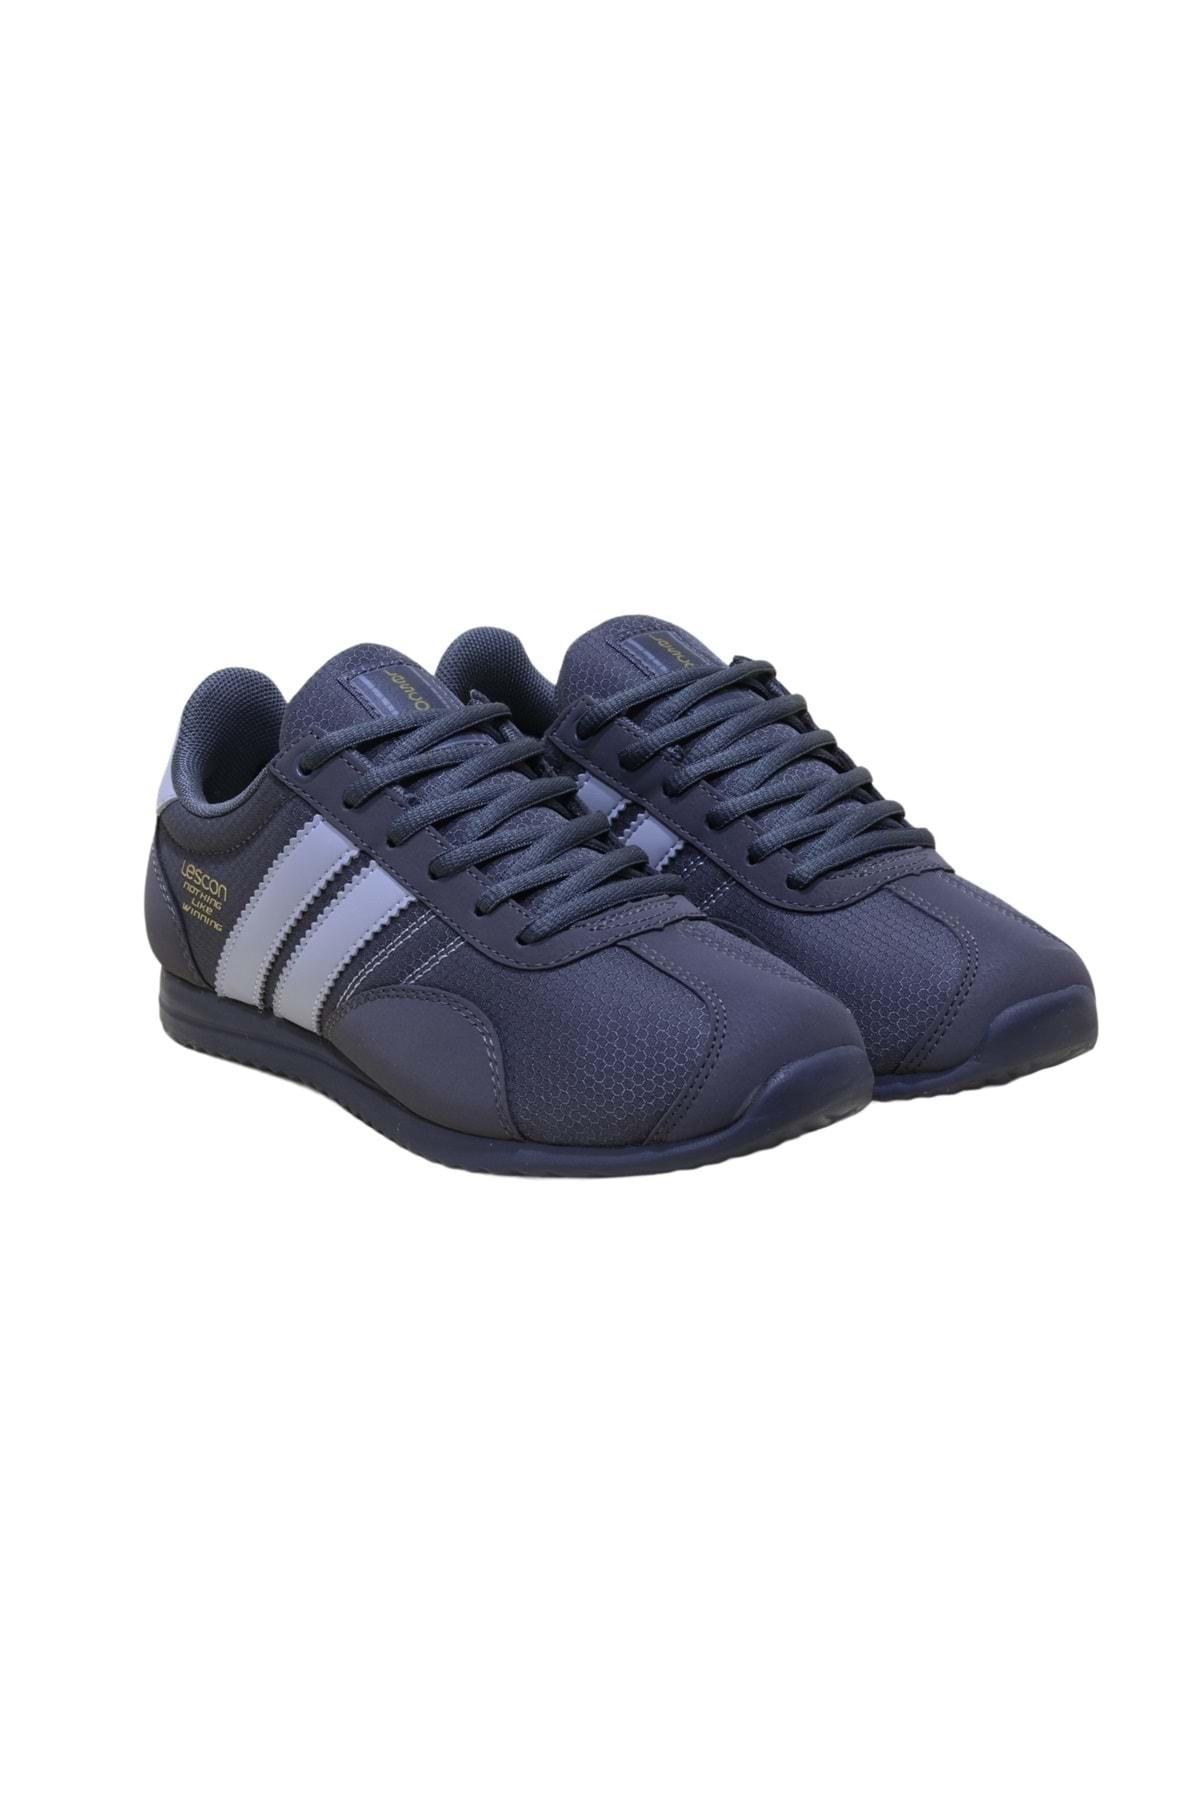 Lescon Gri  Ortopedic Sneakers Ayakkabı 2